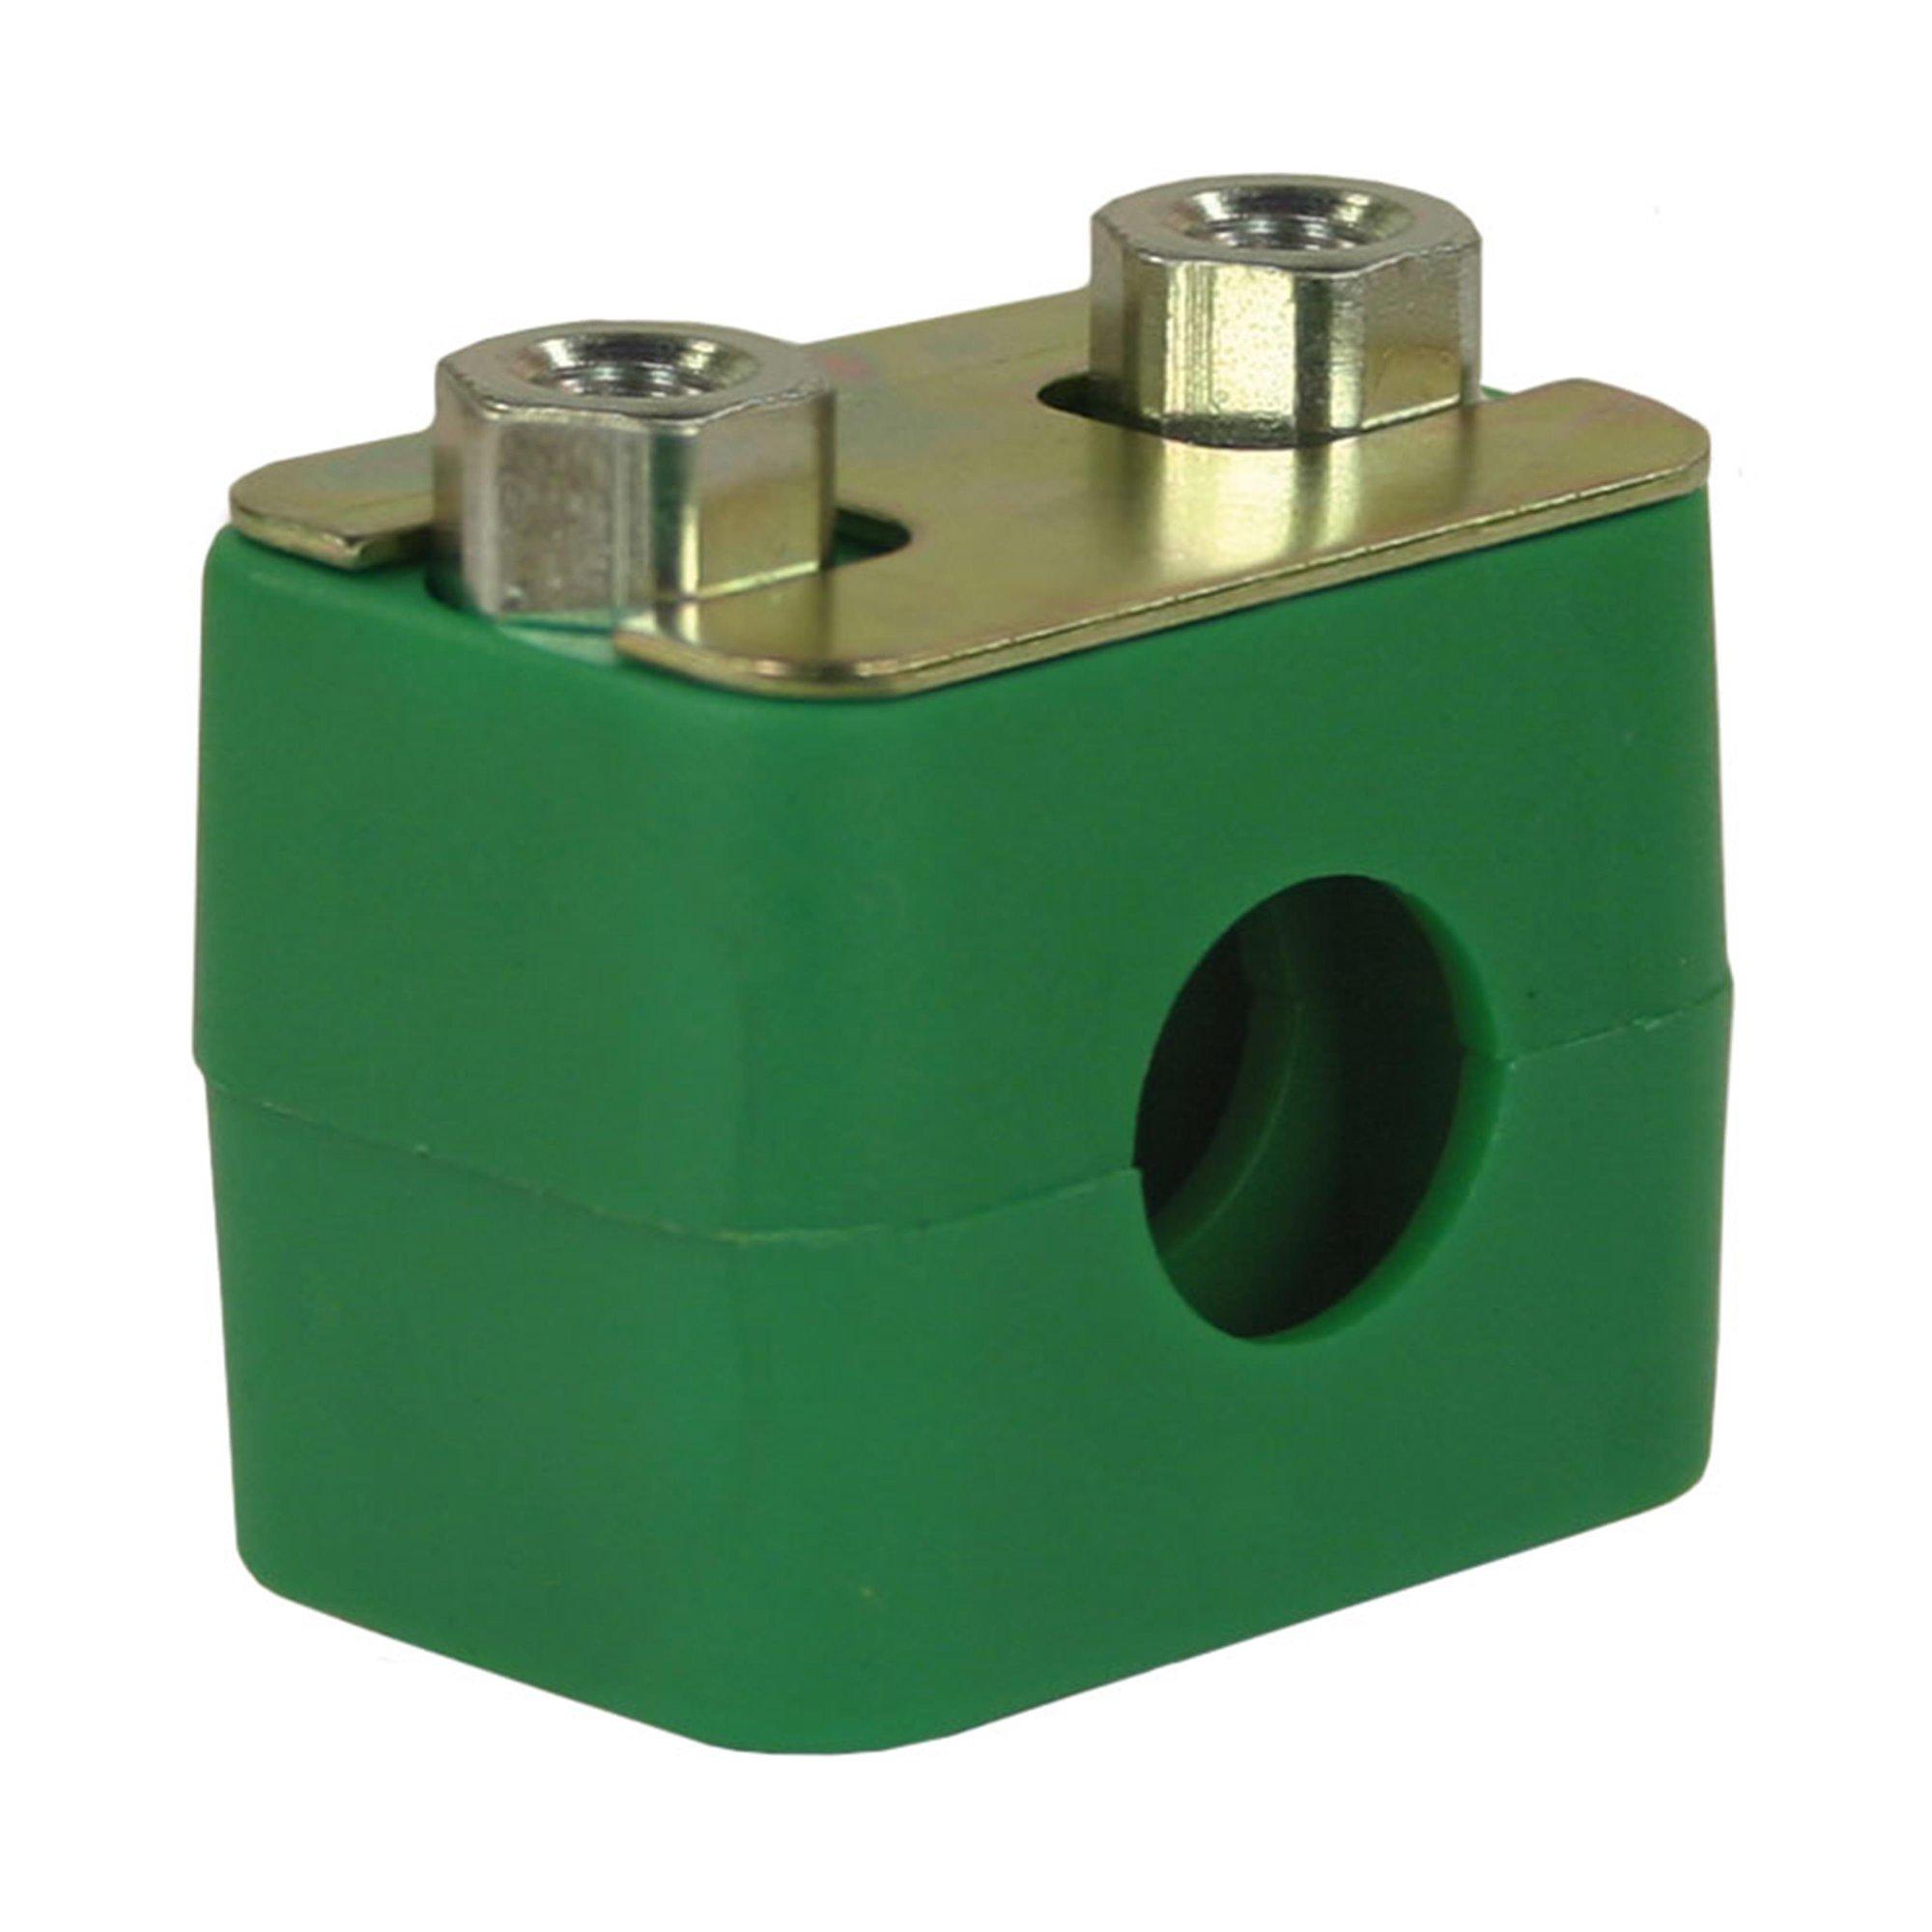 R+M de Wit Rohrschelle 15 mm zum Aufbau